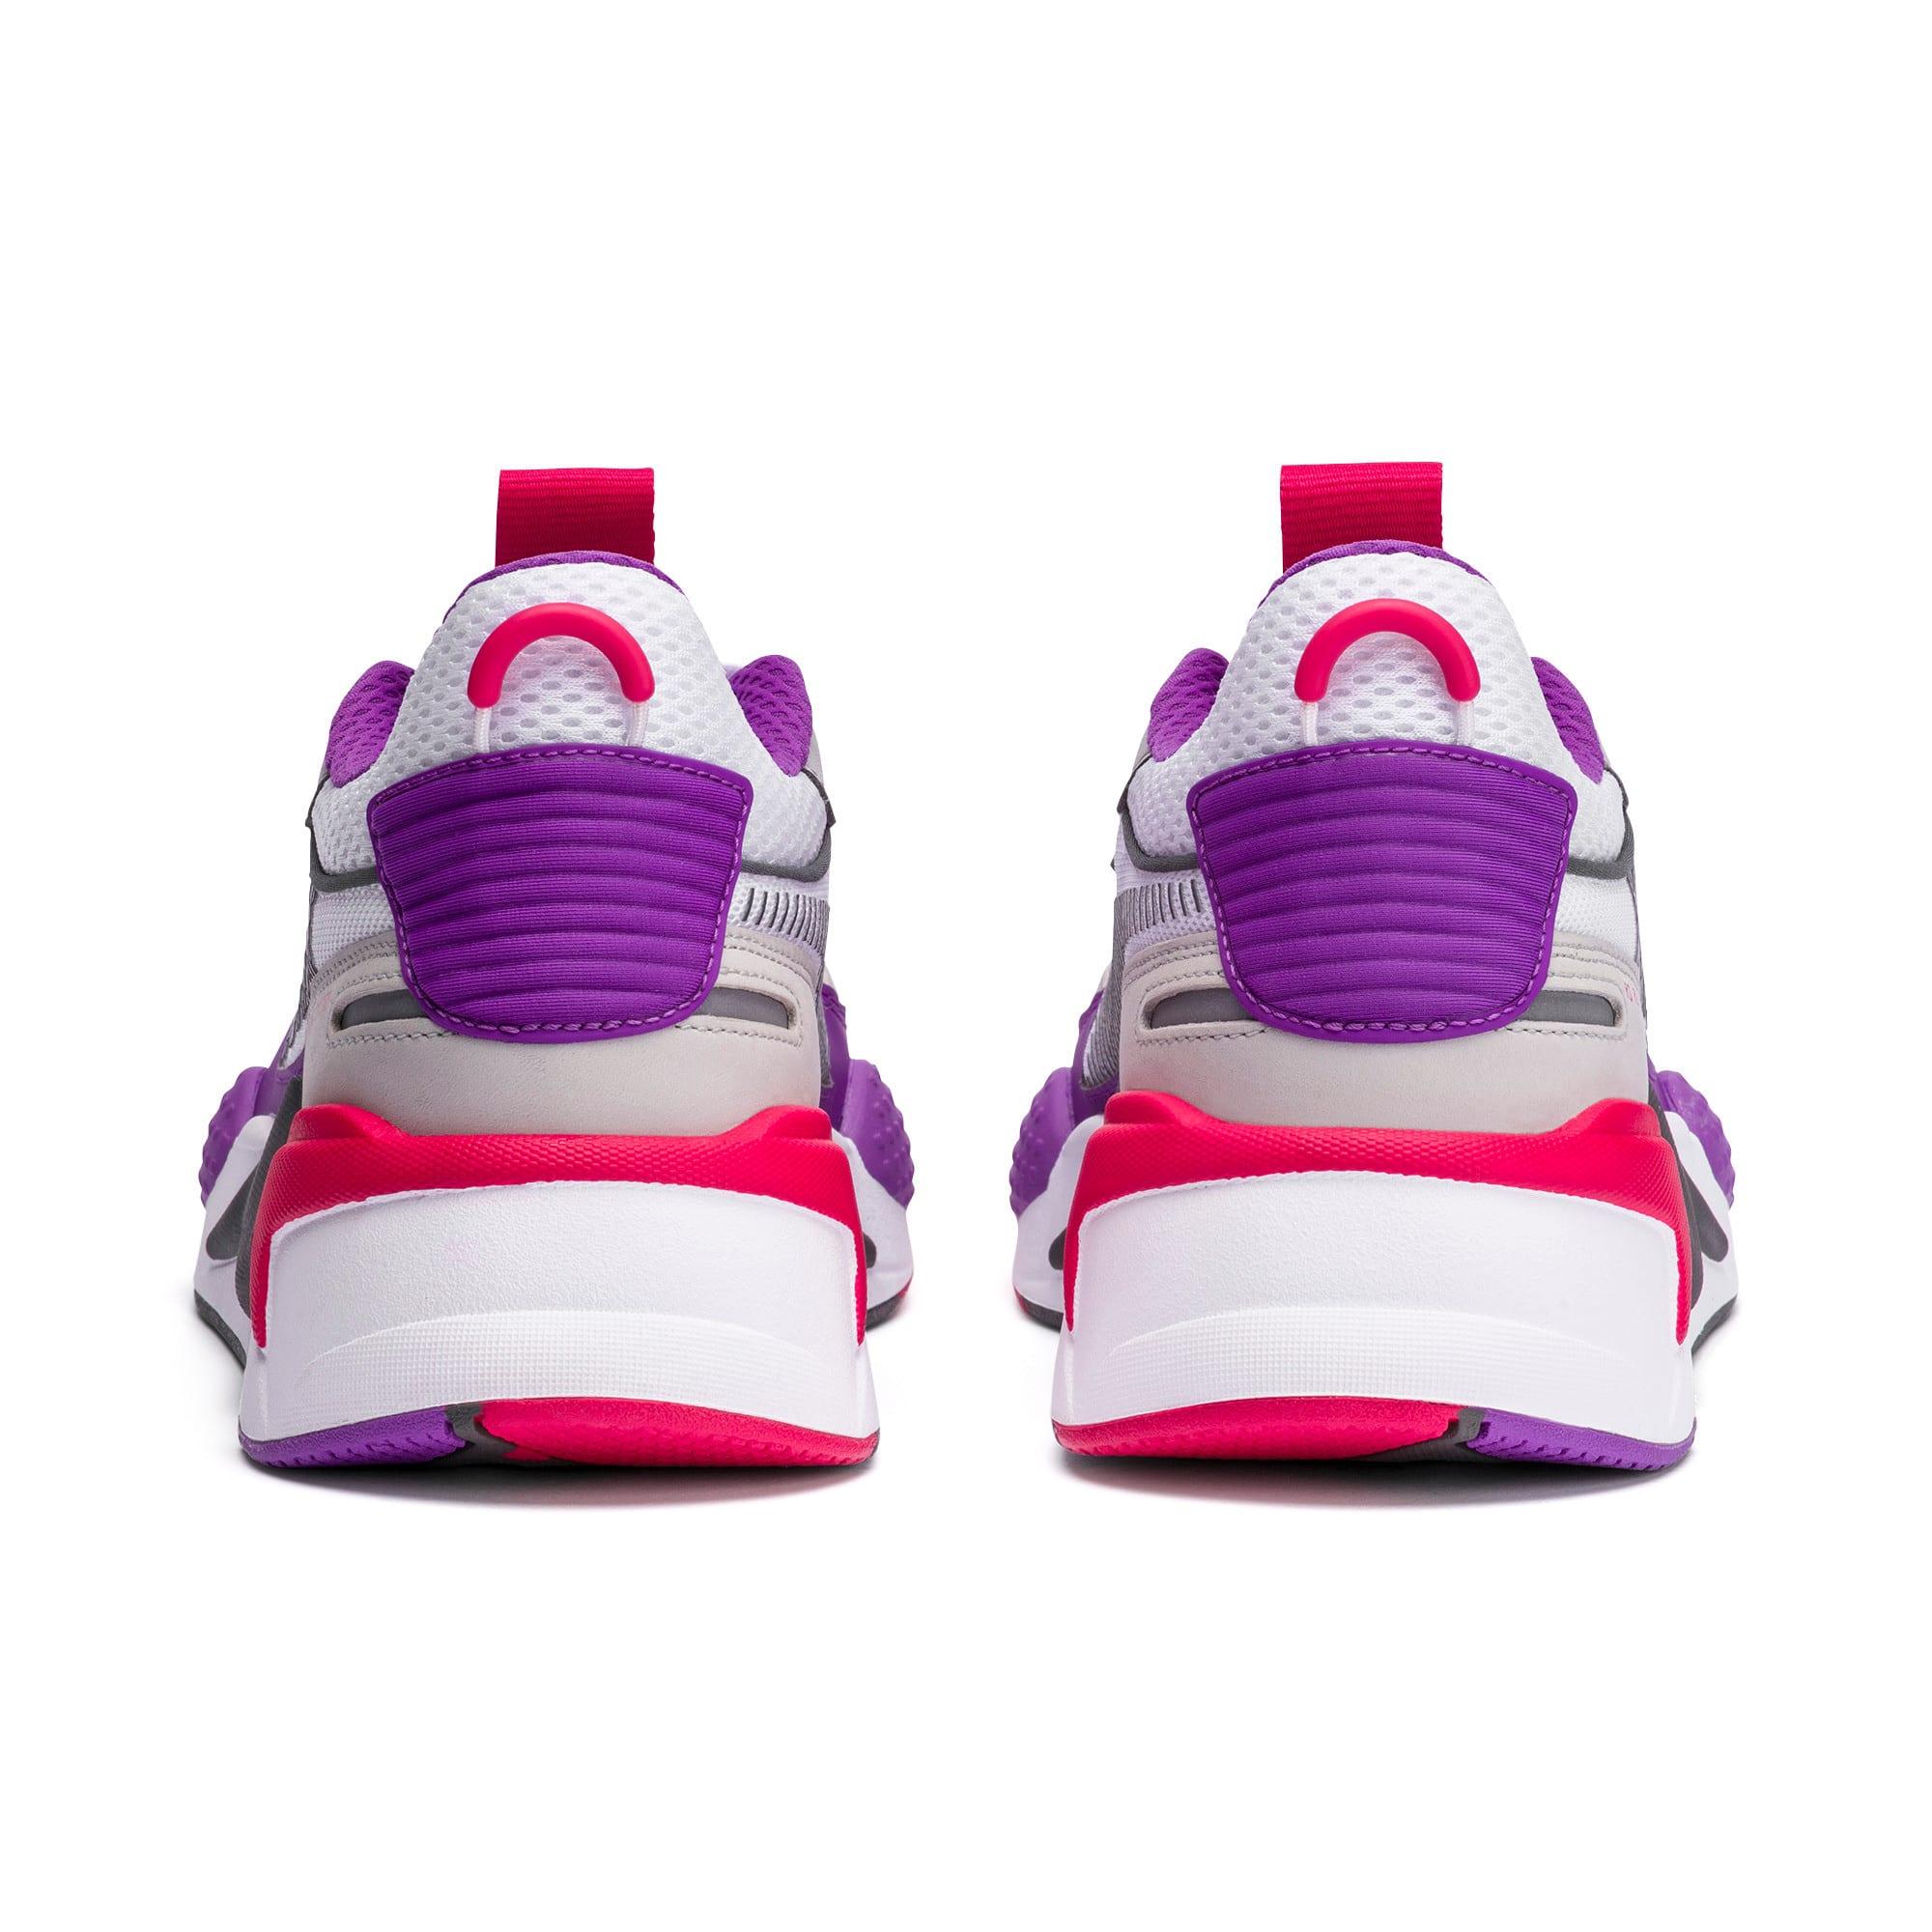 Thumbnail 3 of RS-X Bold Sneaker, PWhite-High Rise-Royal Lilac, medium